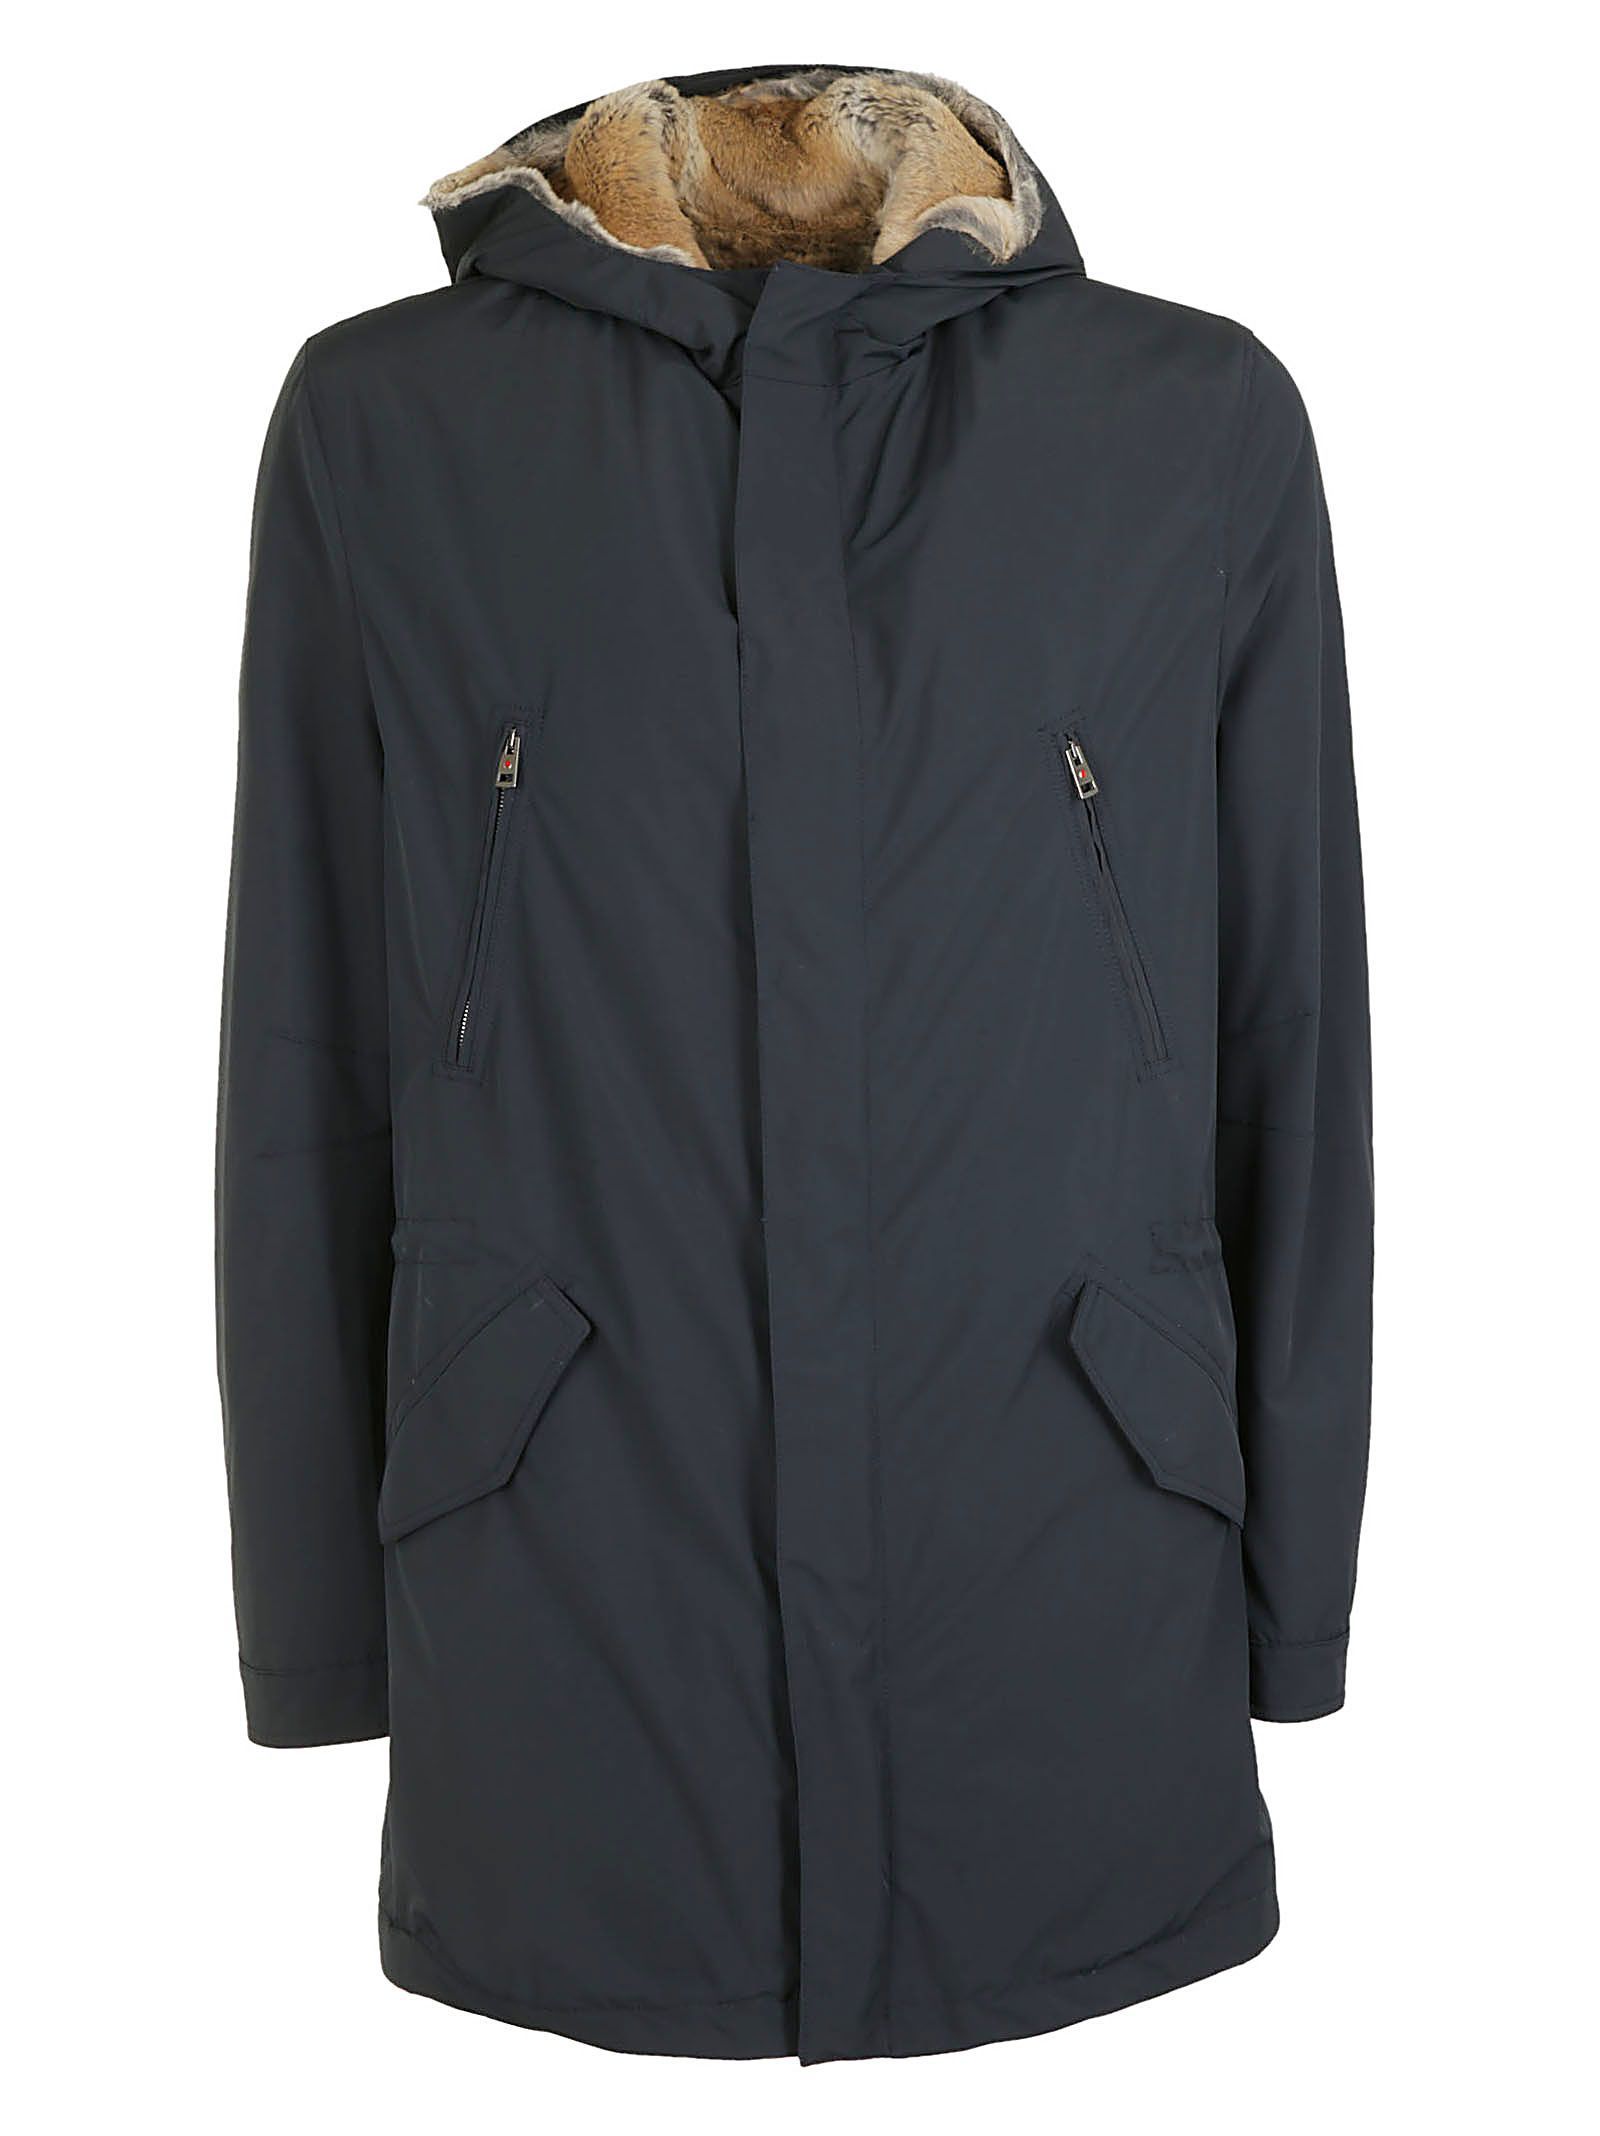 KIRED Hooded Coat in Black